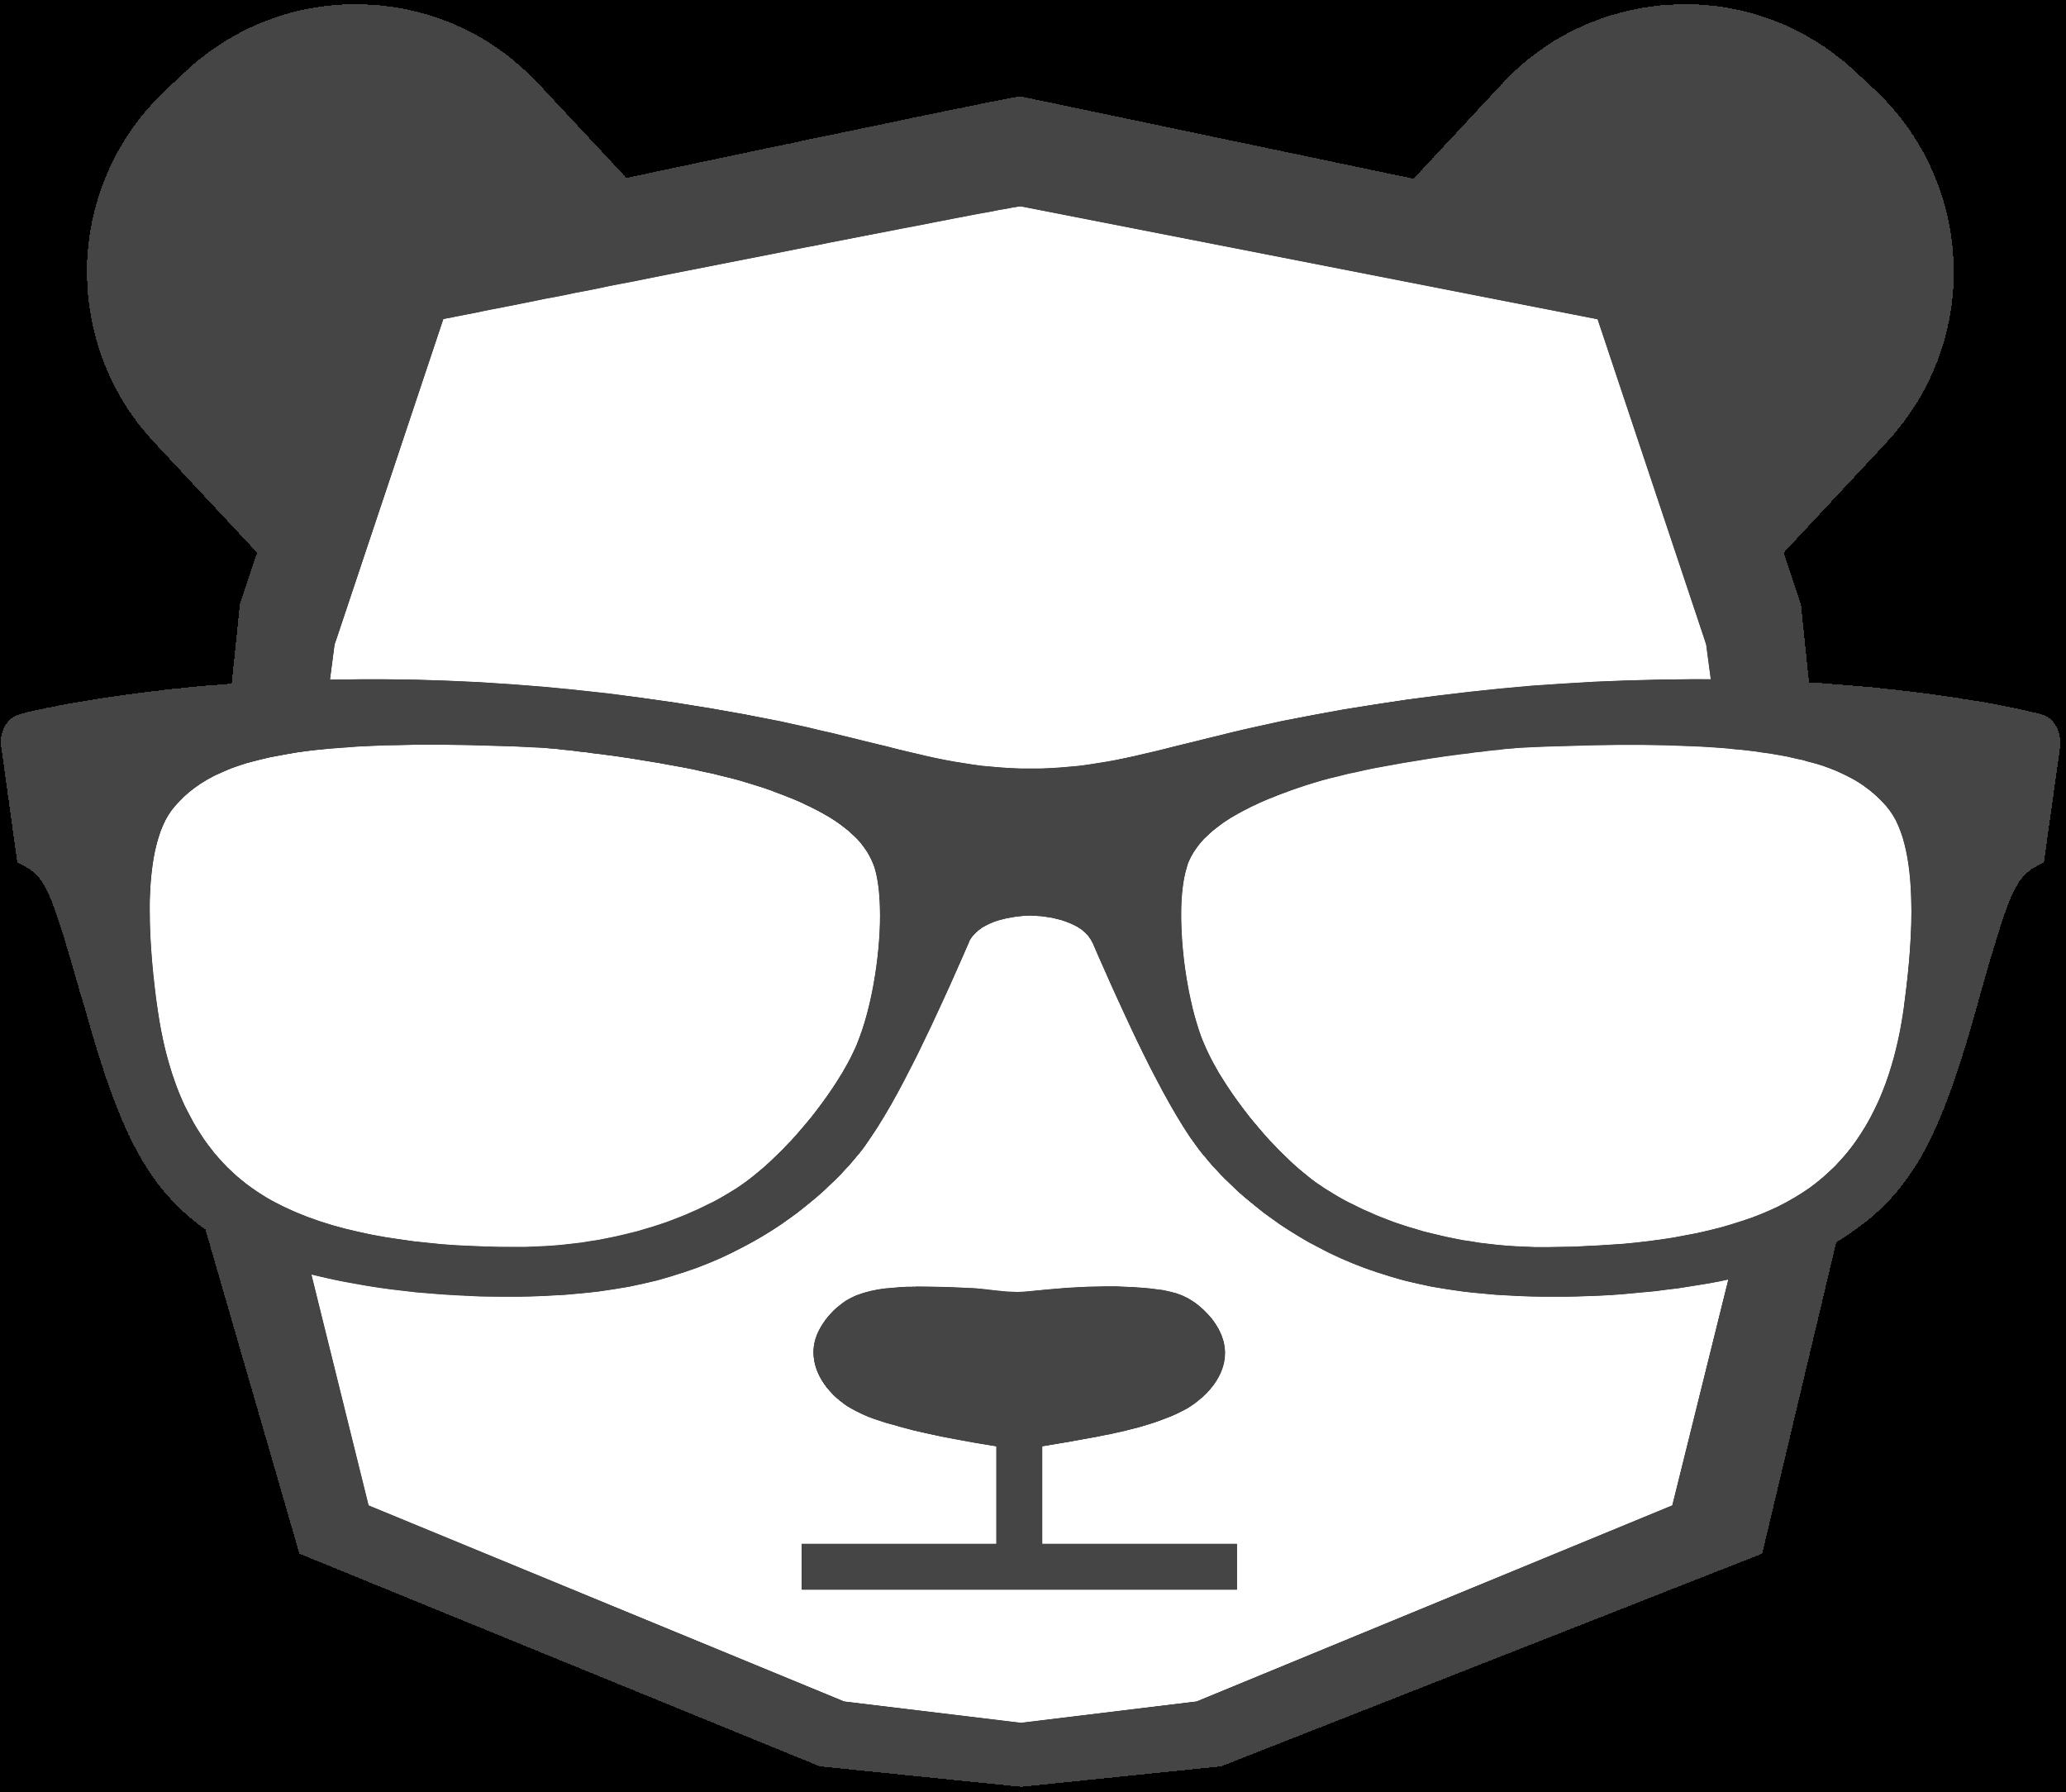 BigPanda のロゴ